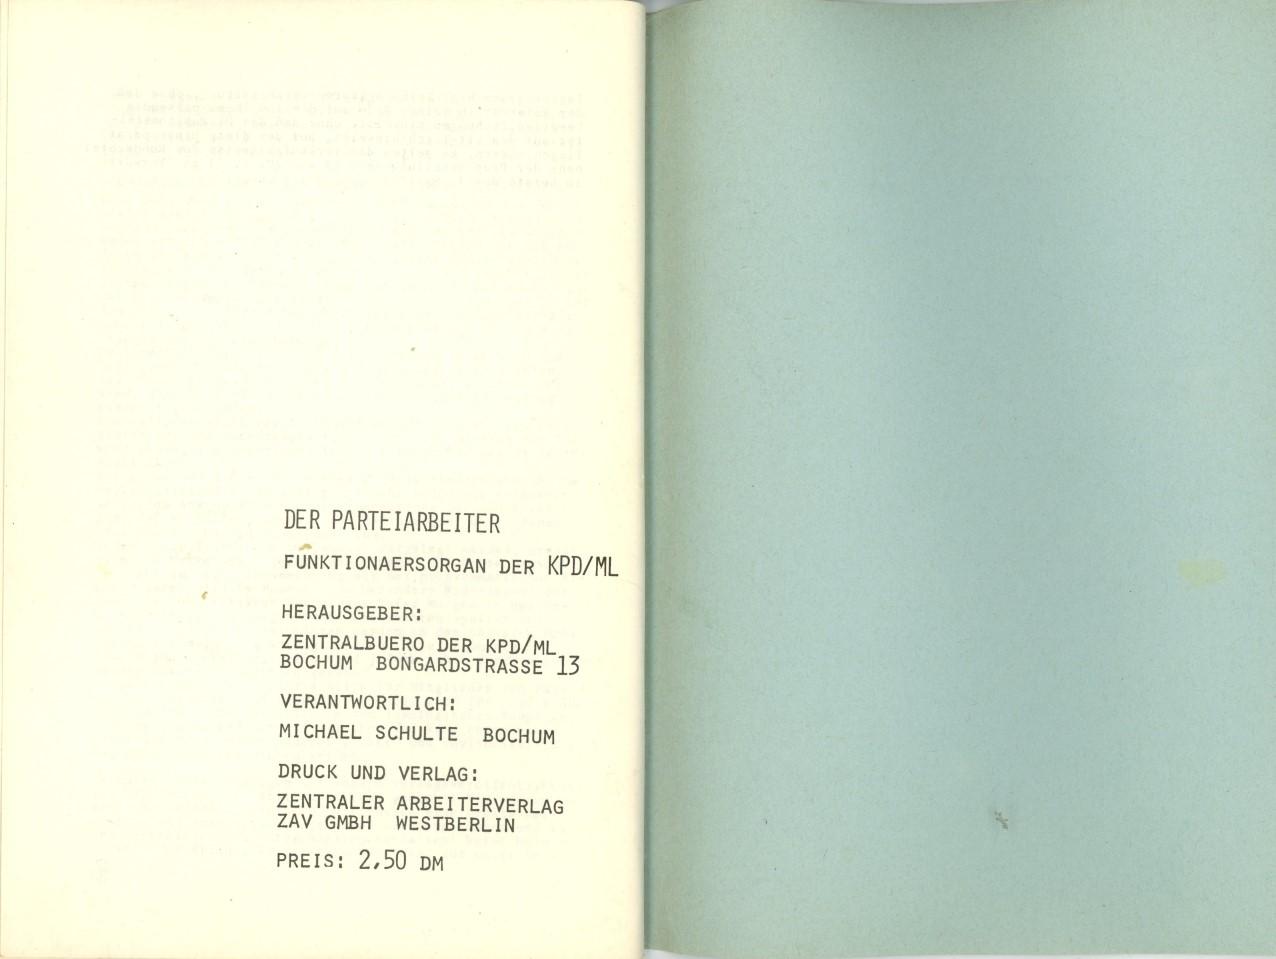 ZB_Parteiarbeiter_1971_06_46